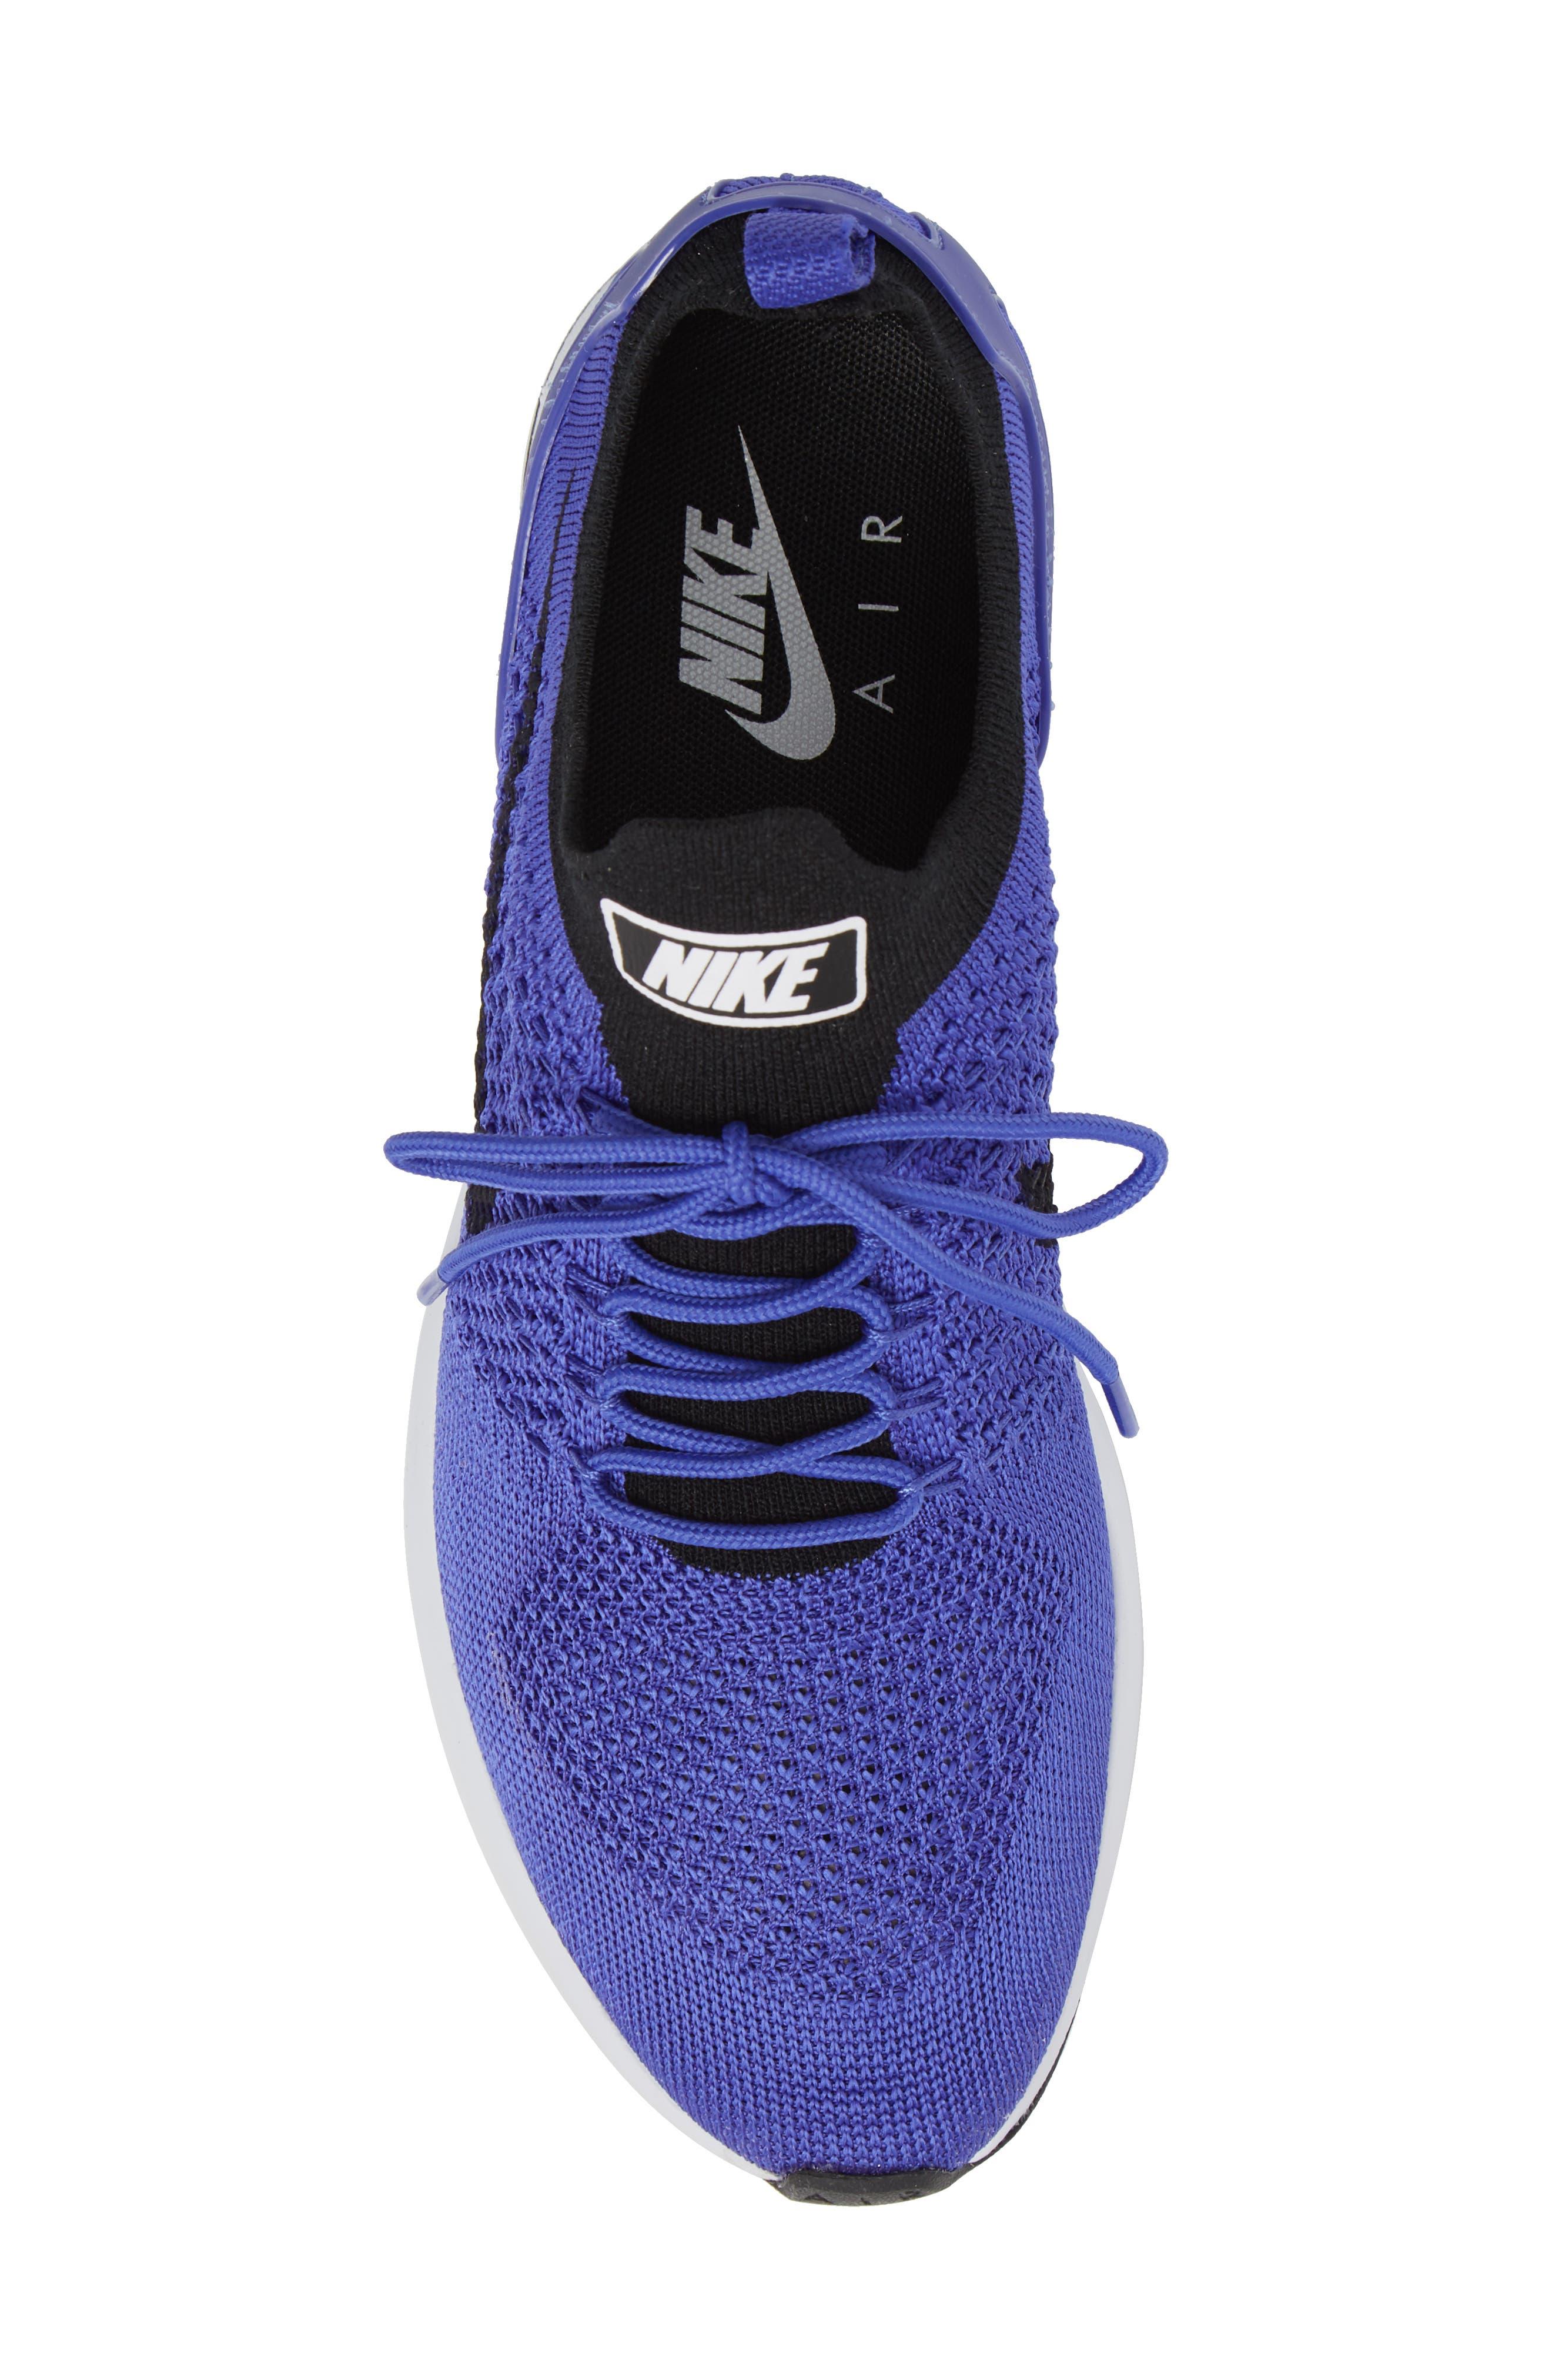 Air Zoom Mariah Flyknit Racer Sneaker,                             Alternate thumbnail 5, color,                             Violet/ Black/ White